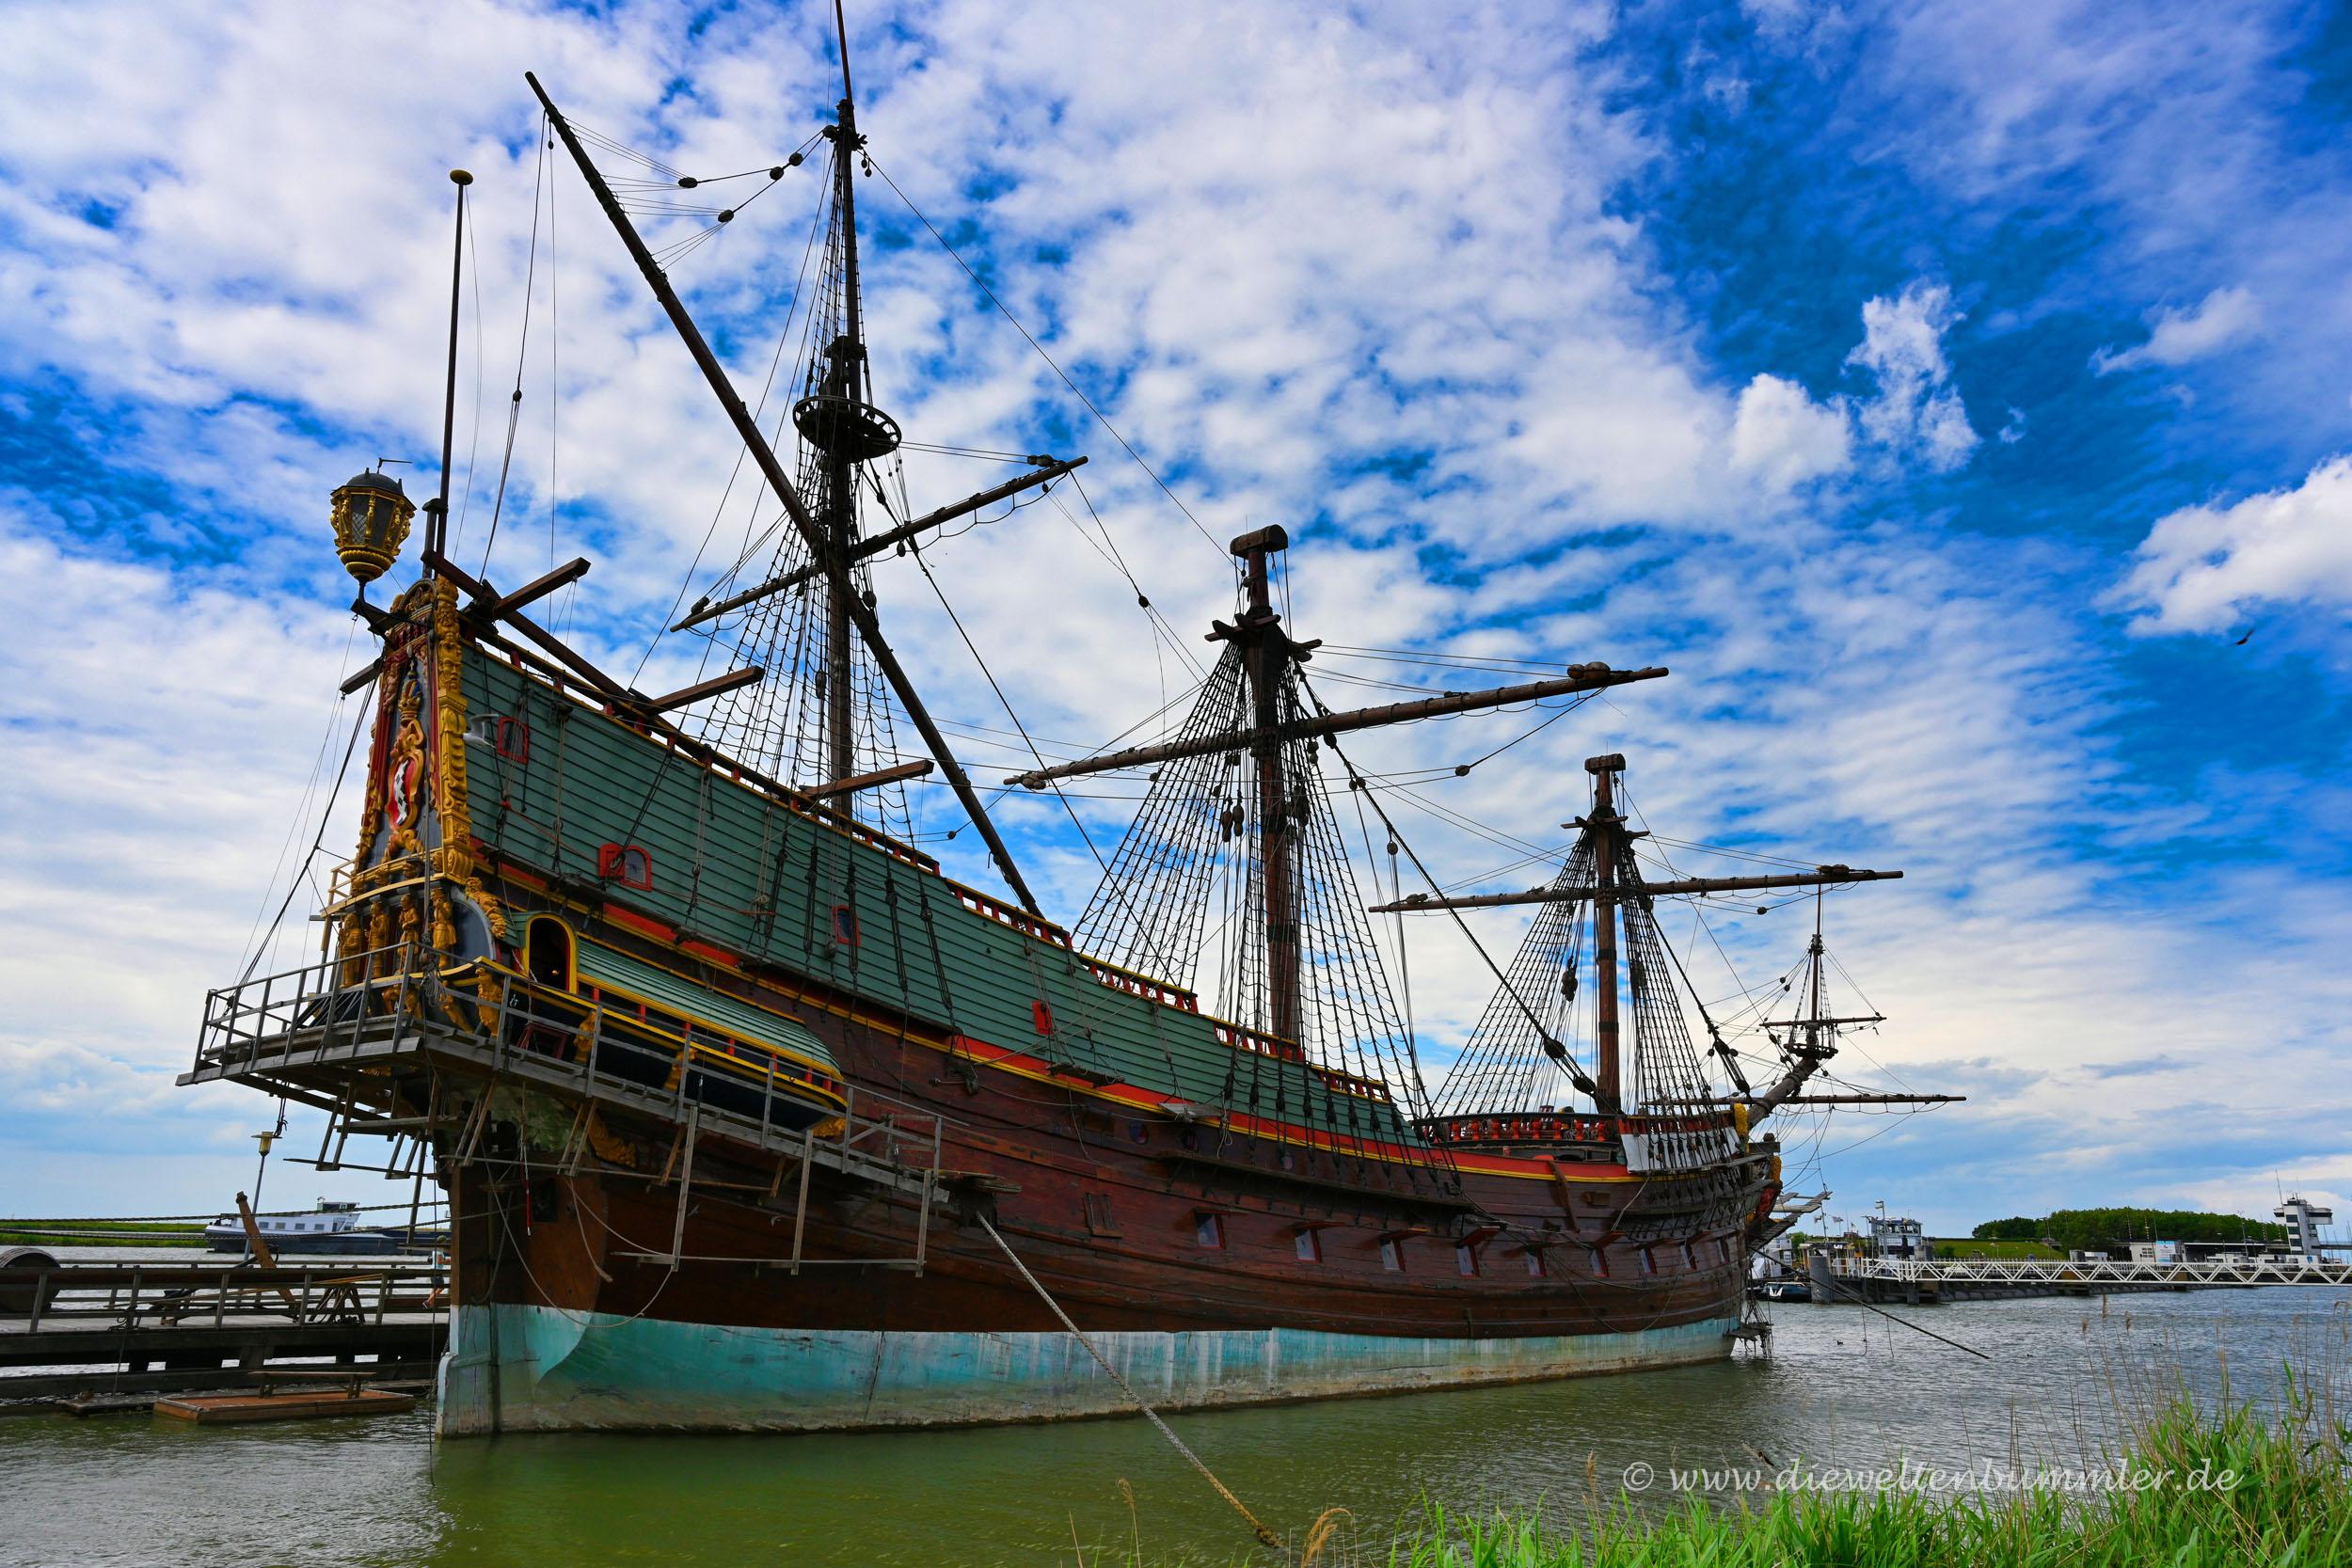 Museumsschiff Batavia